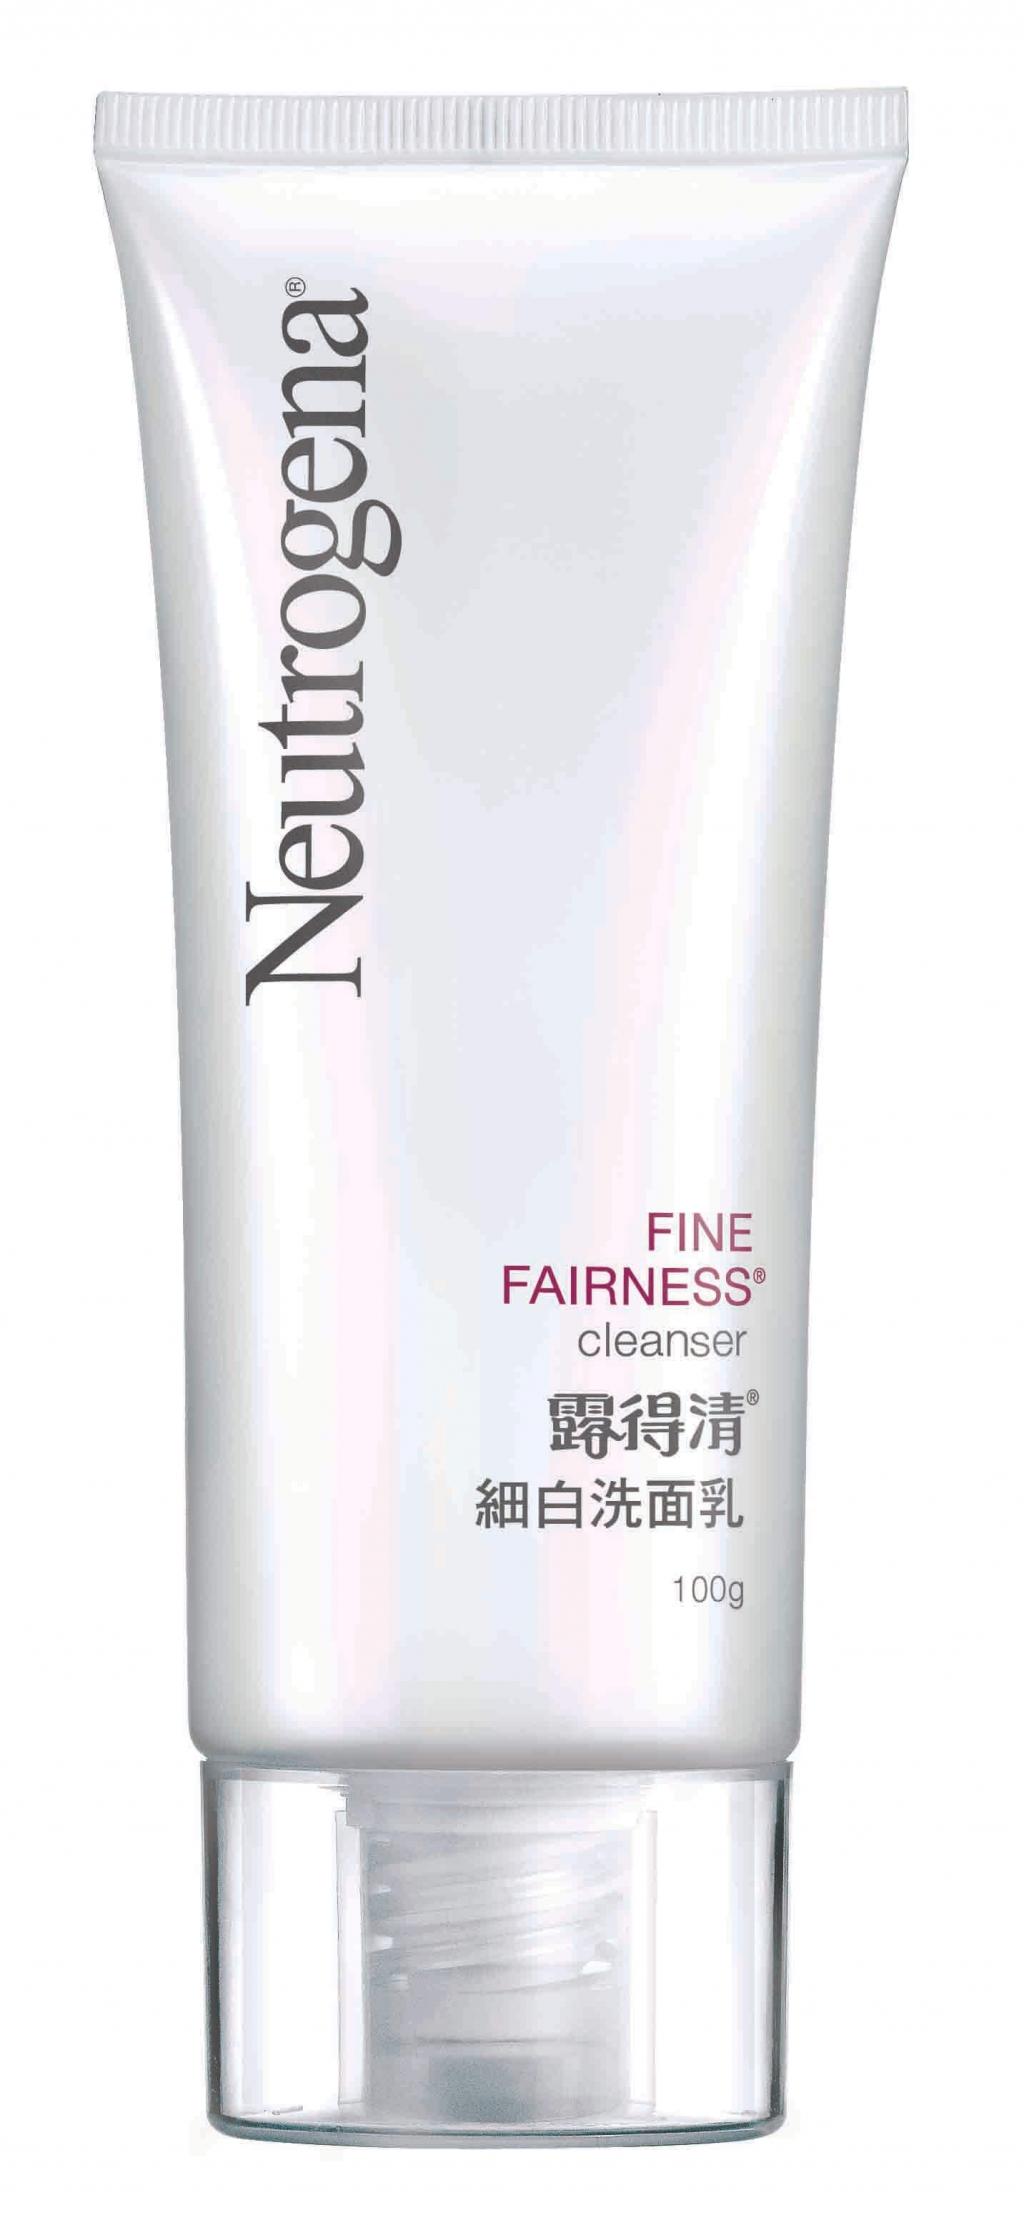 Neutrogena® Fine Fairness® Cleanser 100g